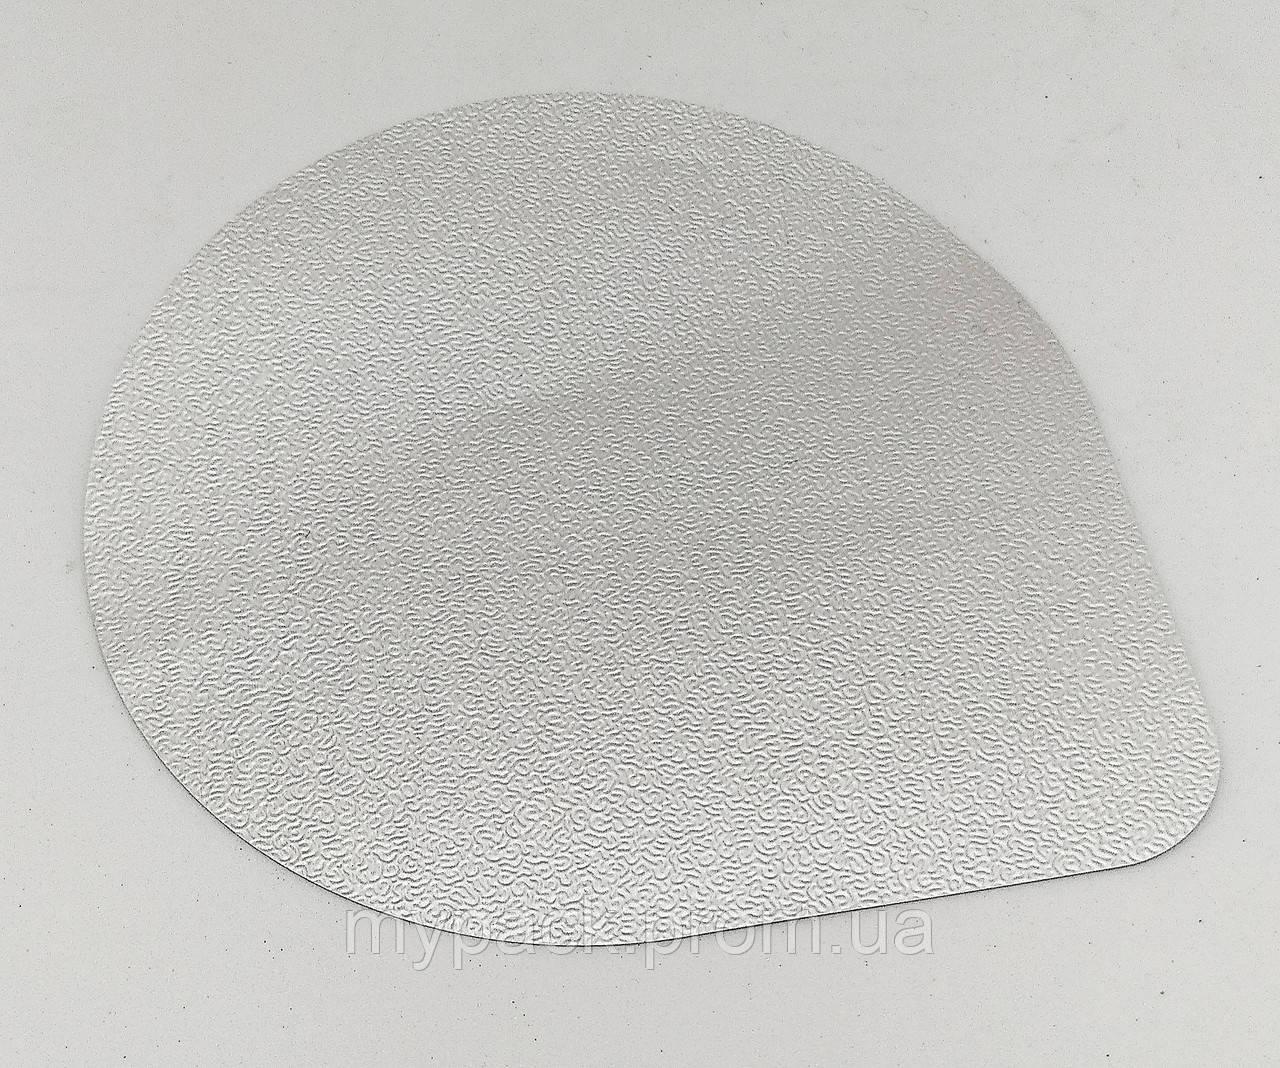 Фольга для индуктивной запайки диаметр 65 мм - 100 шт